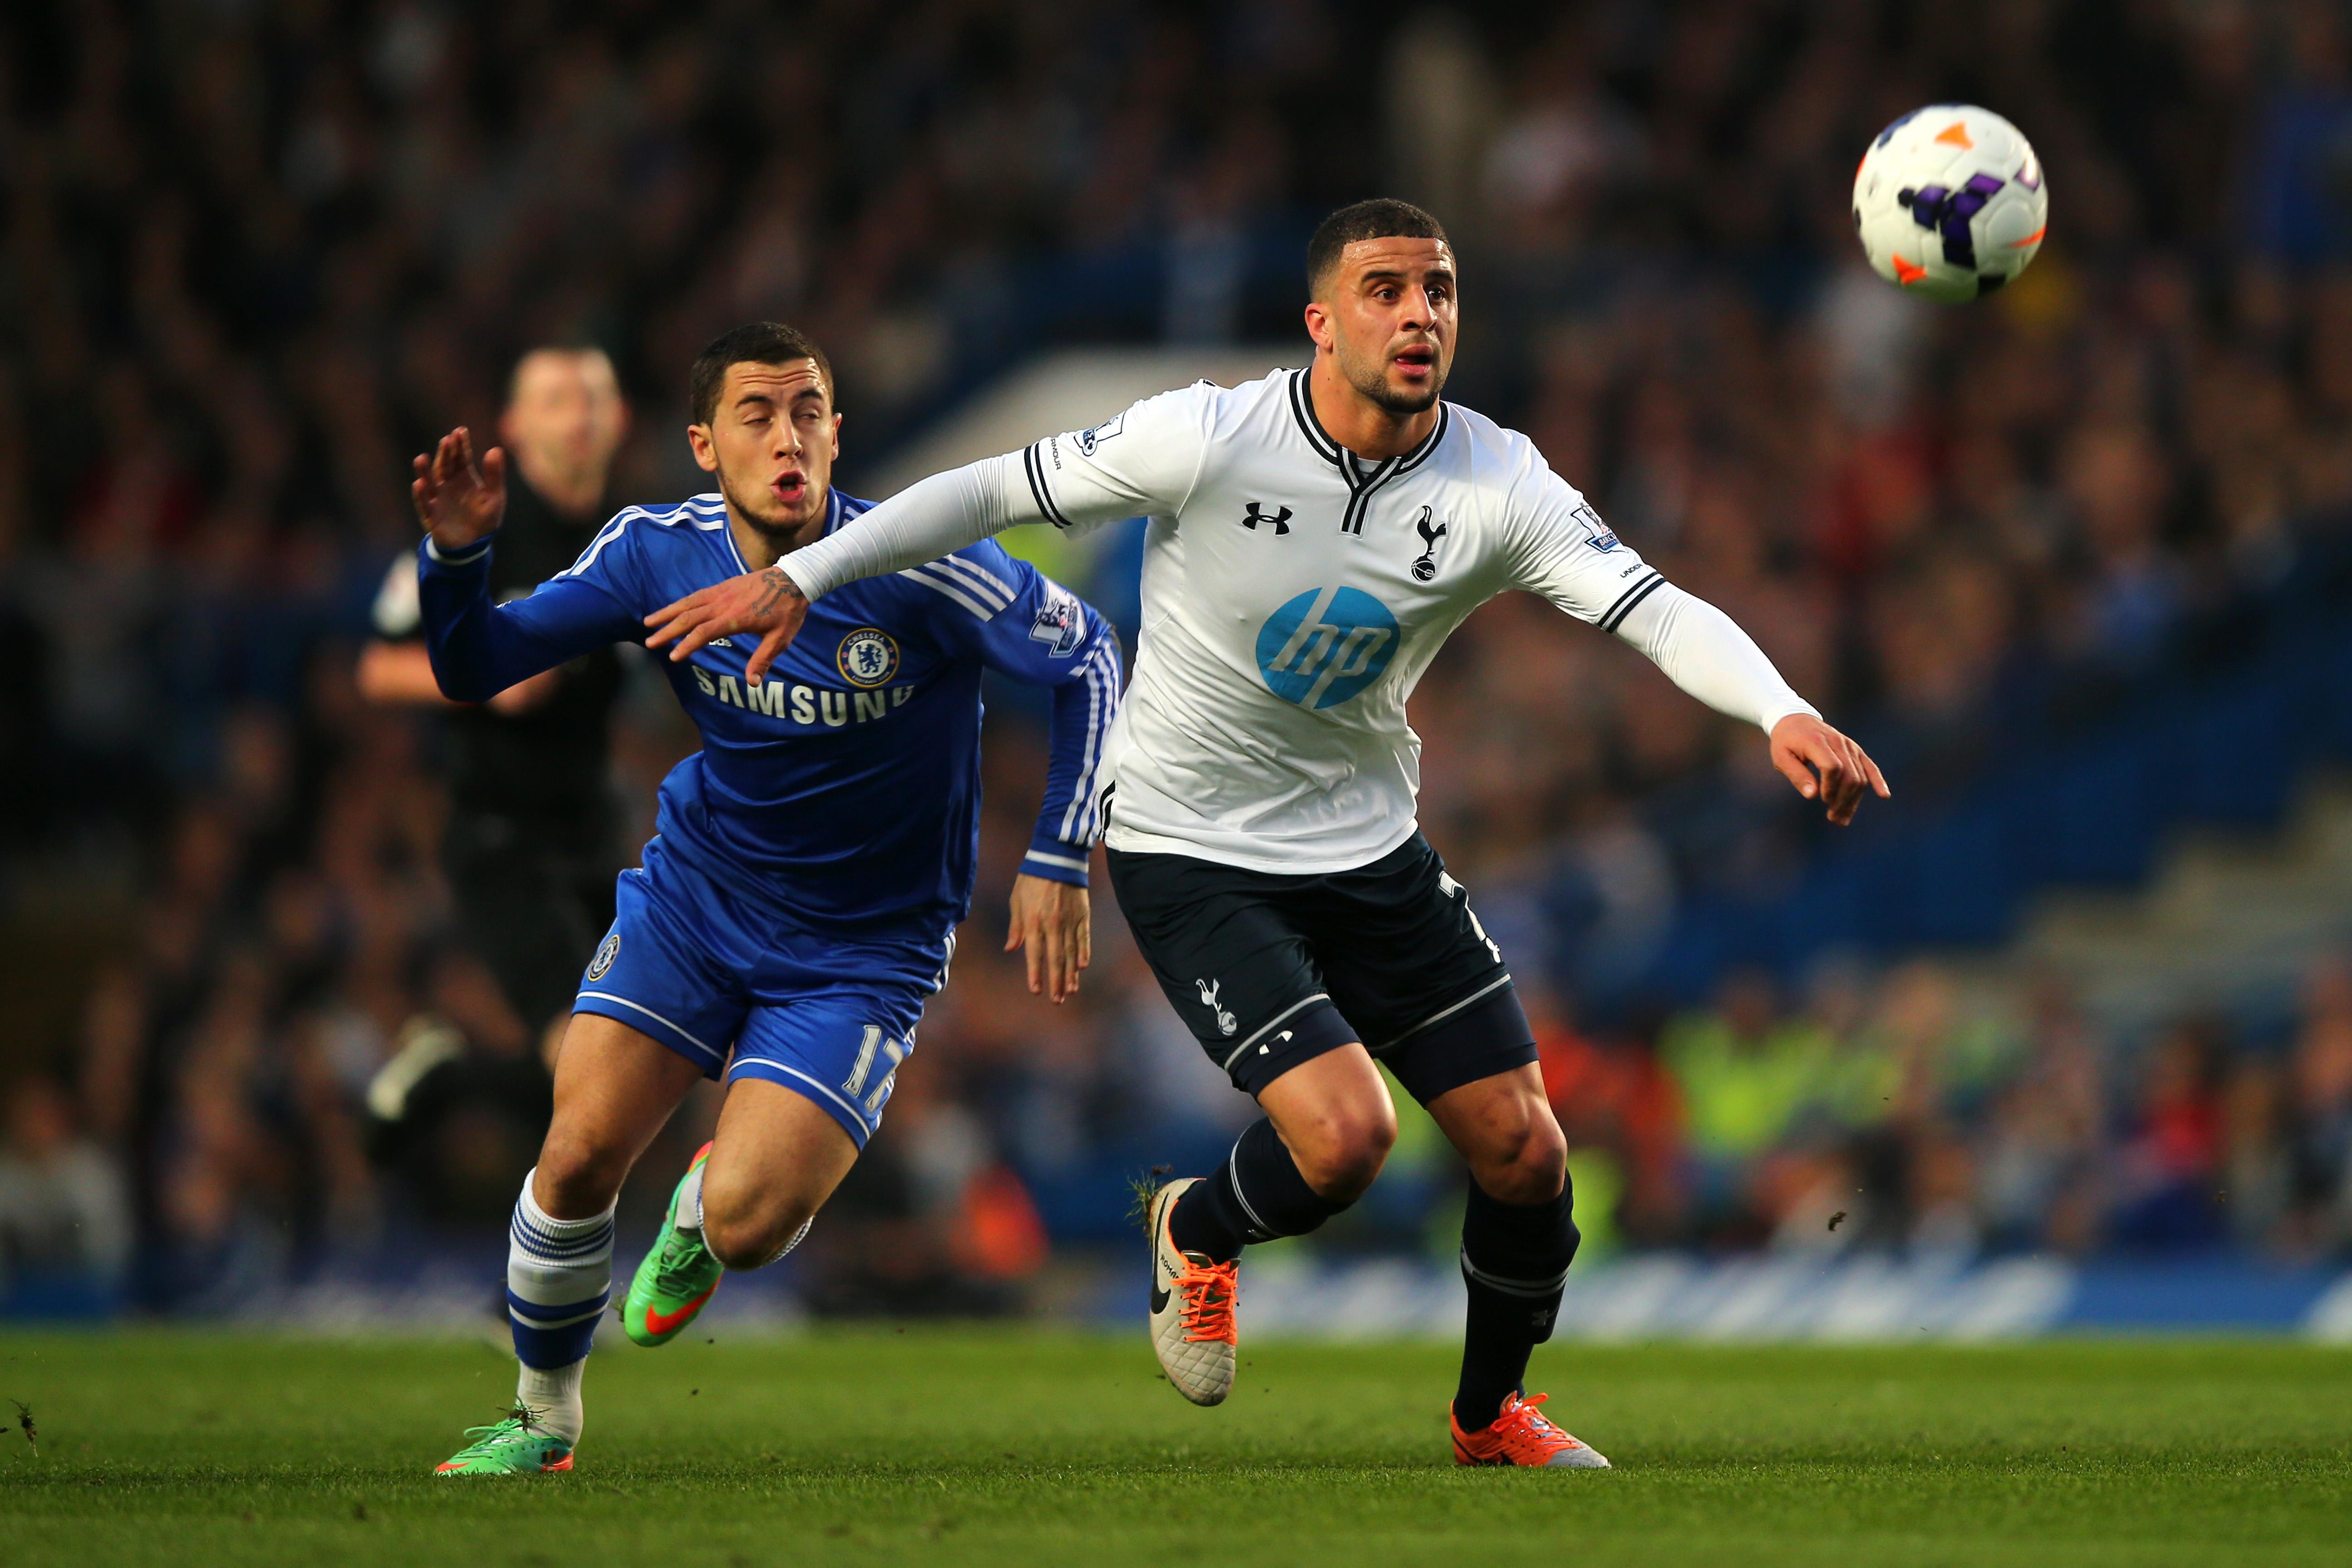 Bossing Eden Hazard just like he will in the final